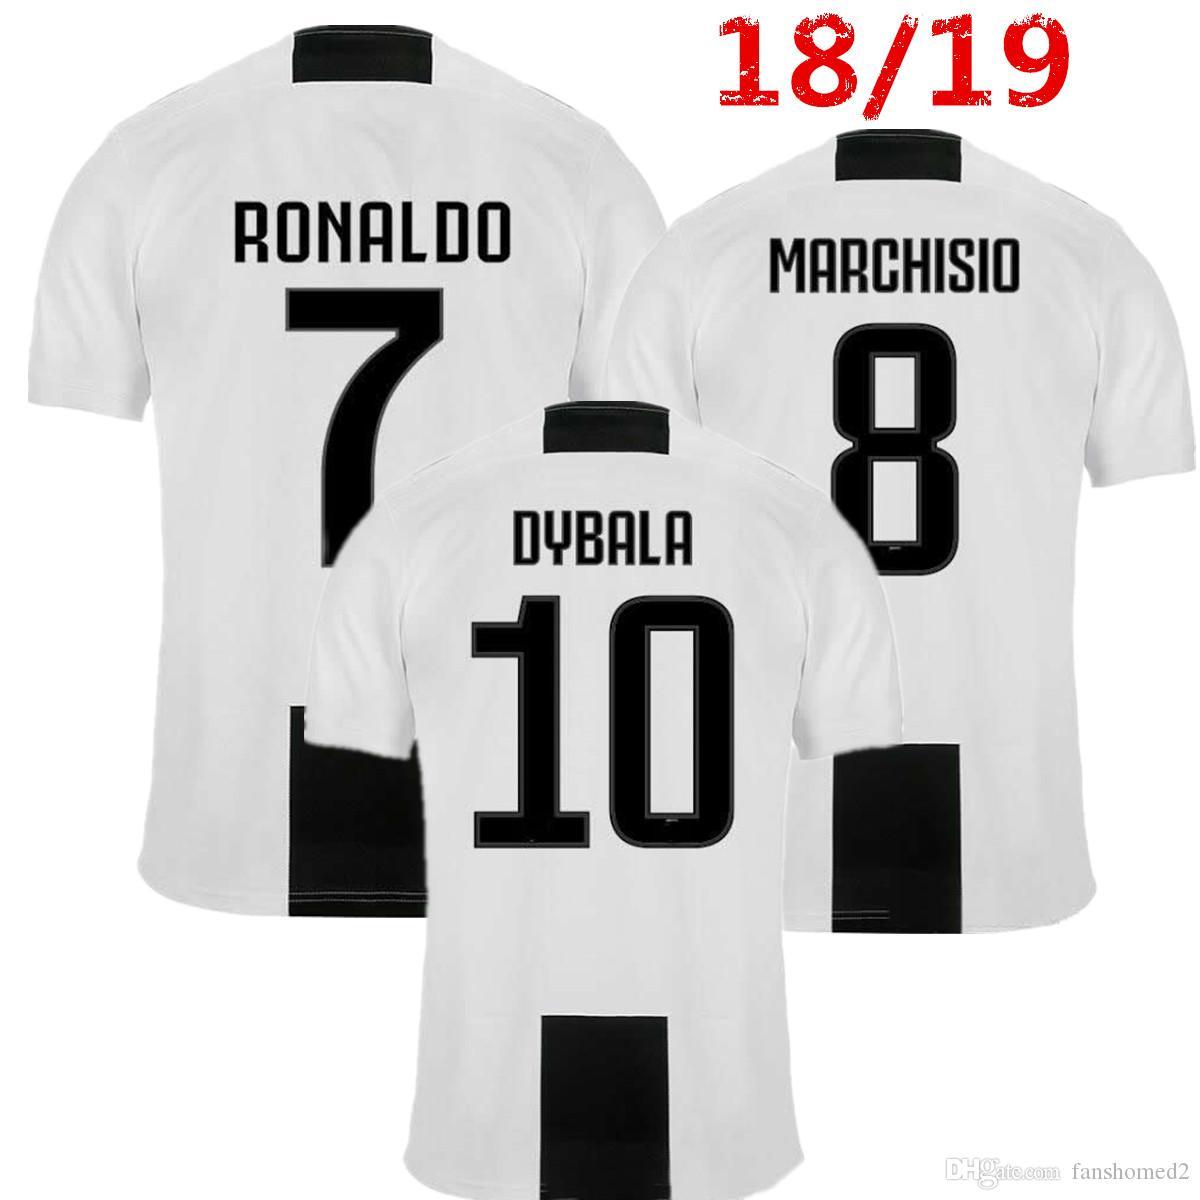 tenue de foot Juventus achat